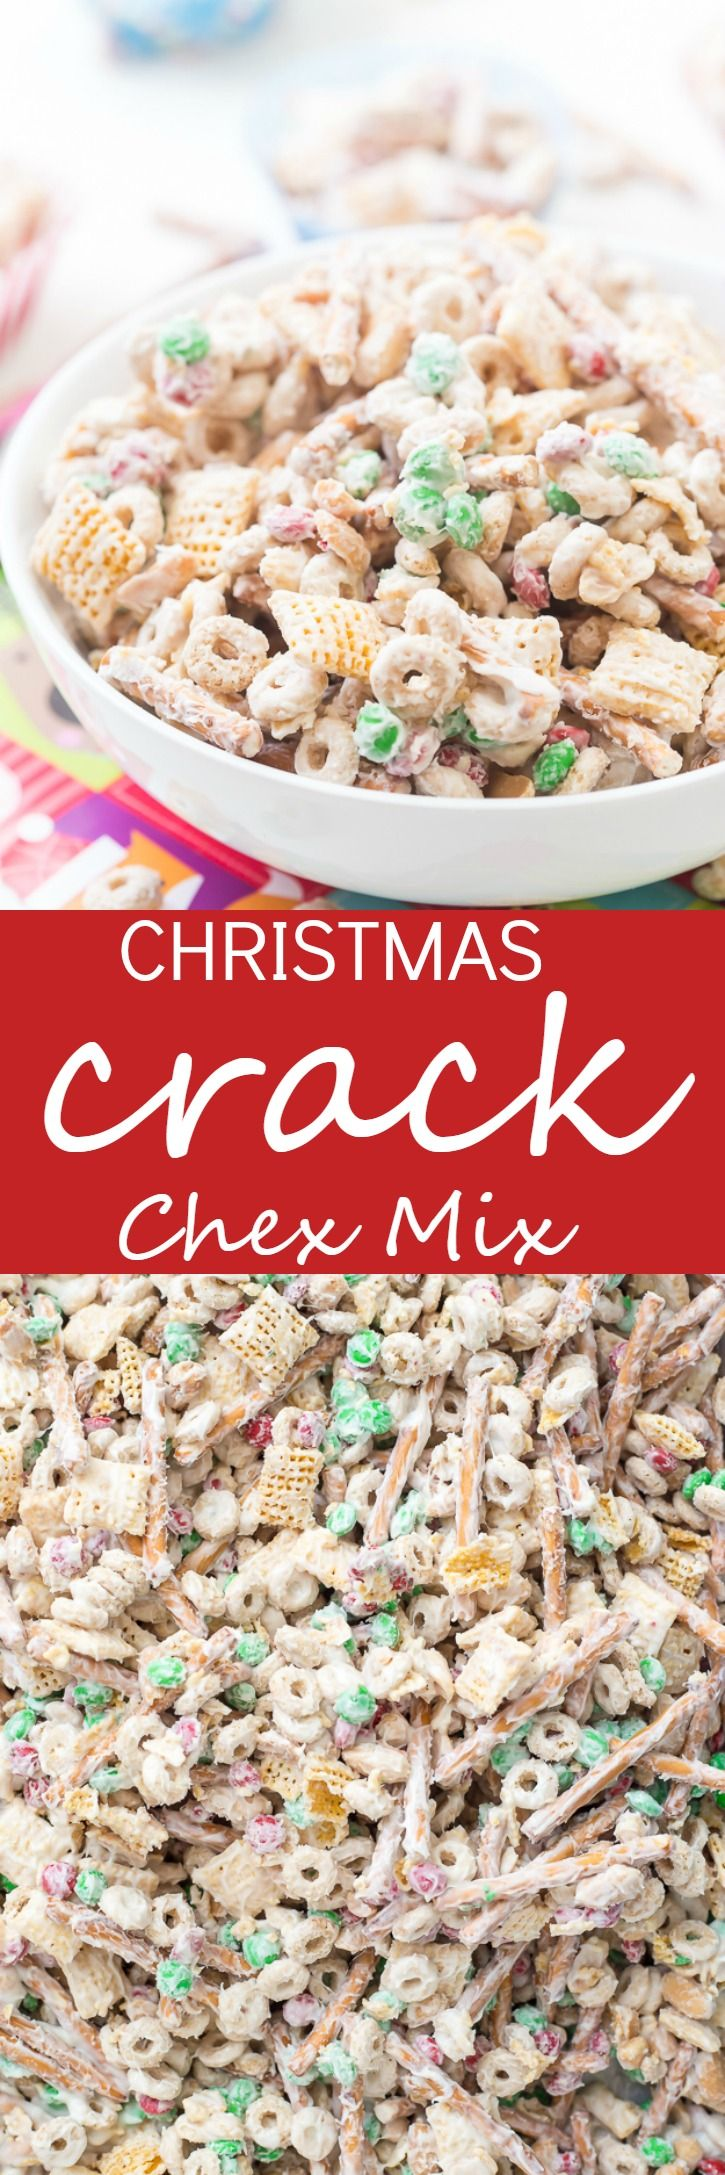 Christmas Crack Chex Mix